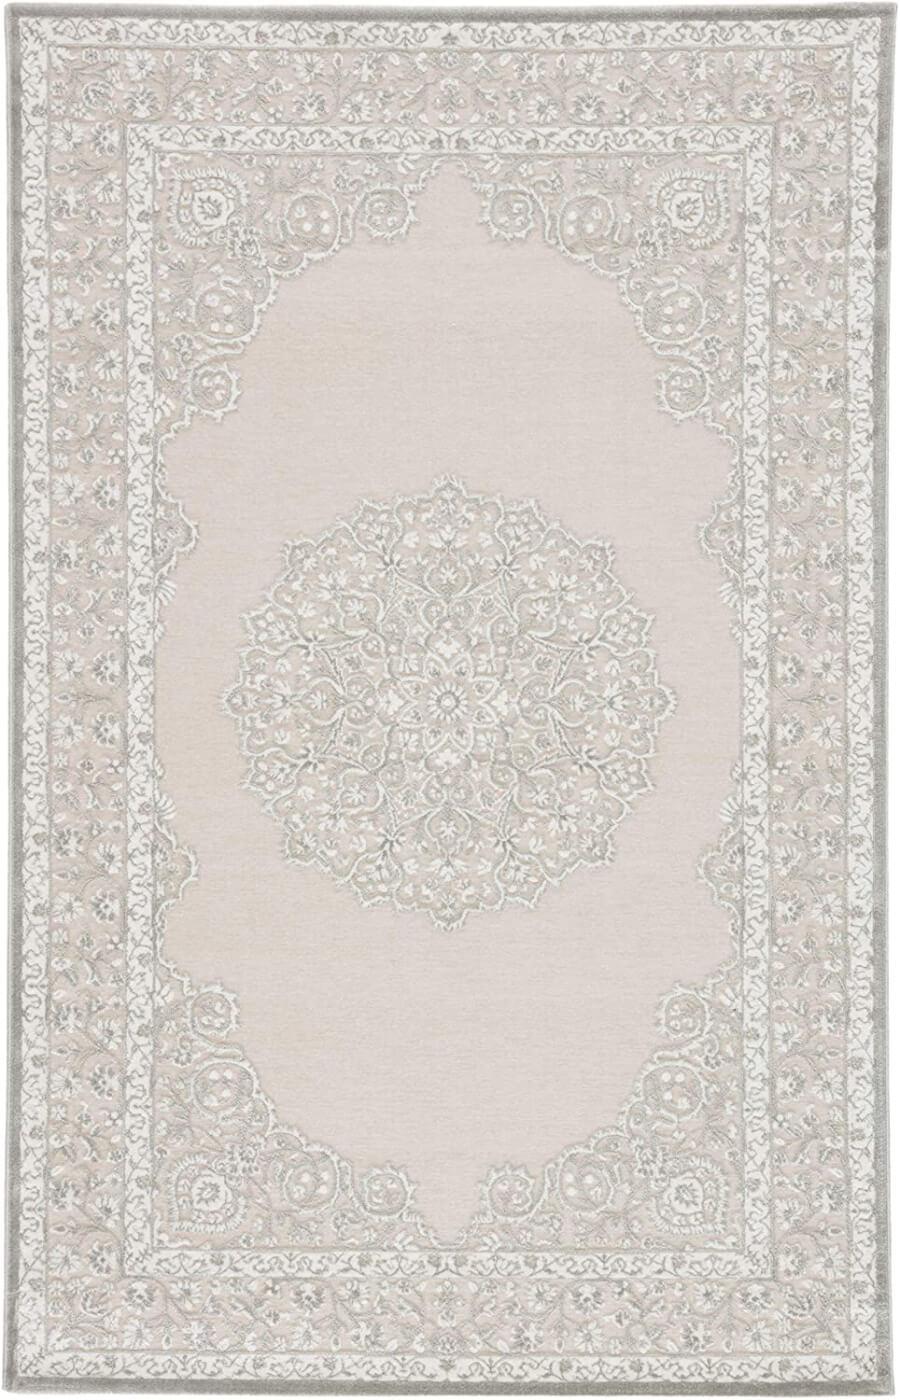 White Oriental Rug